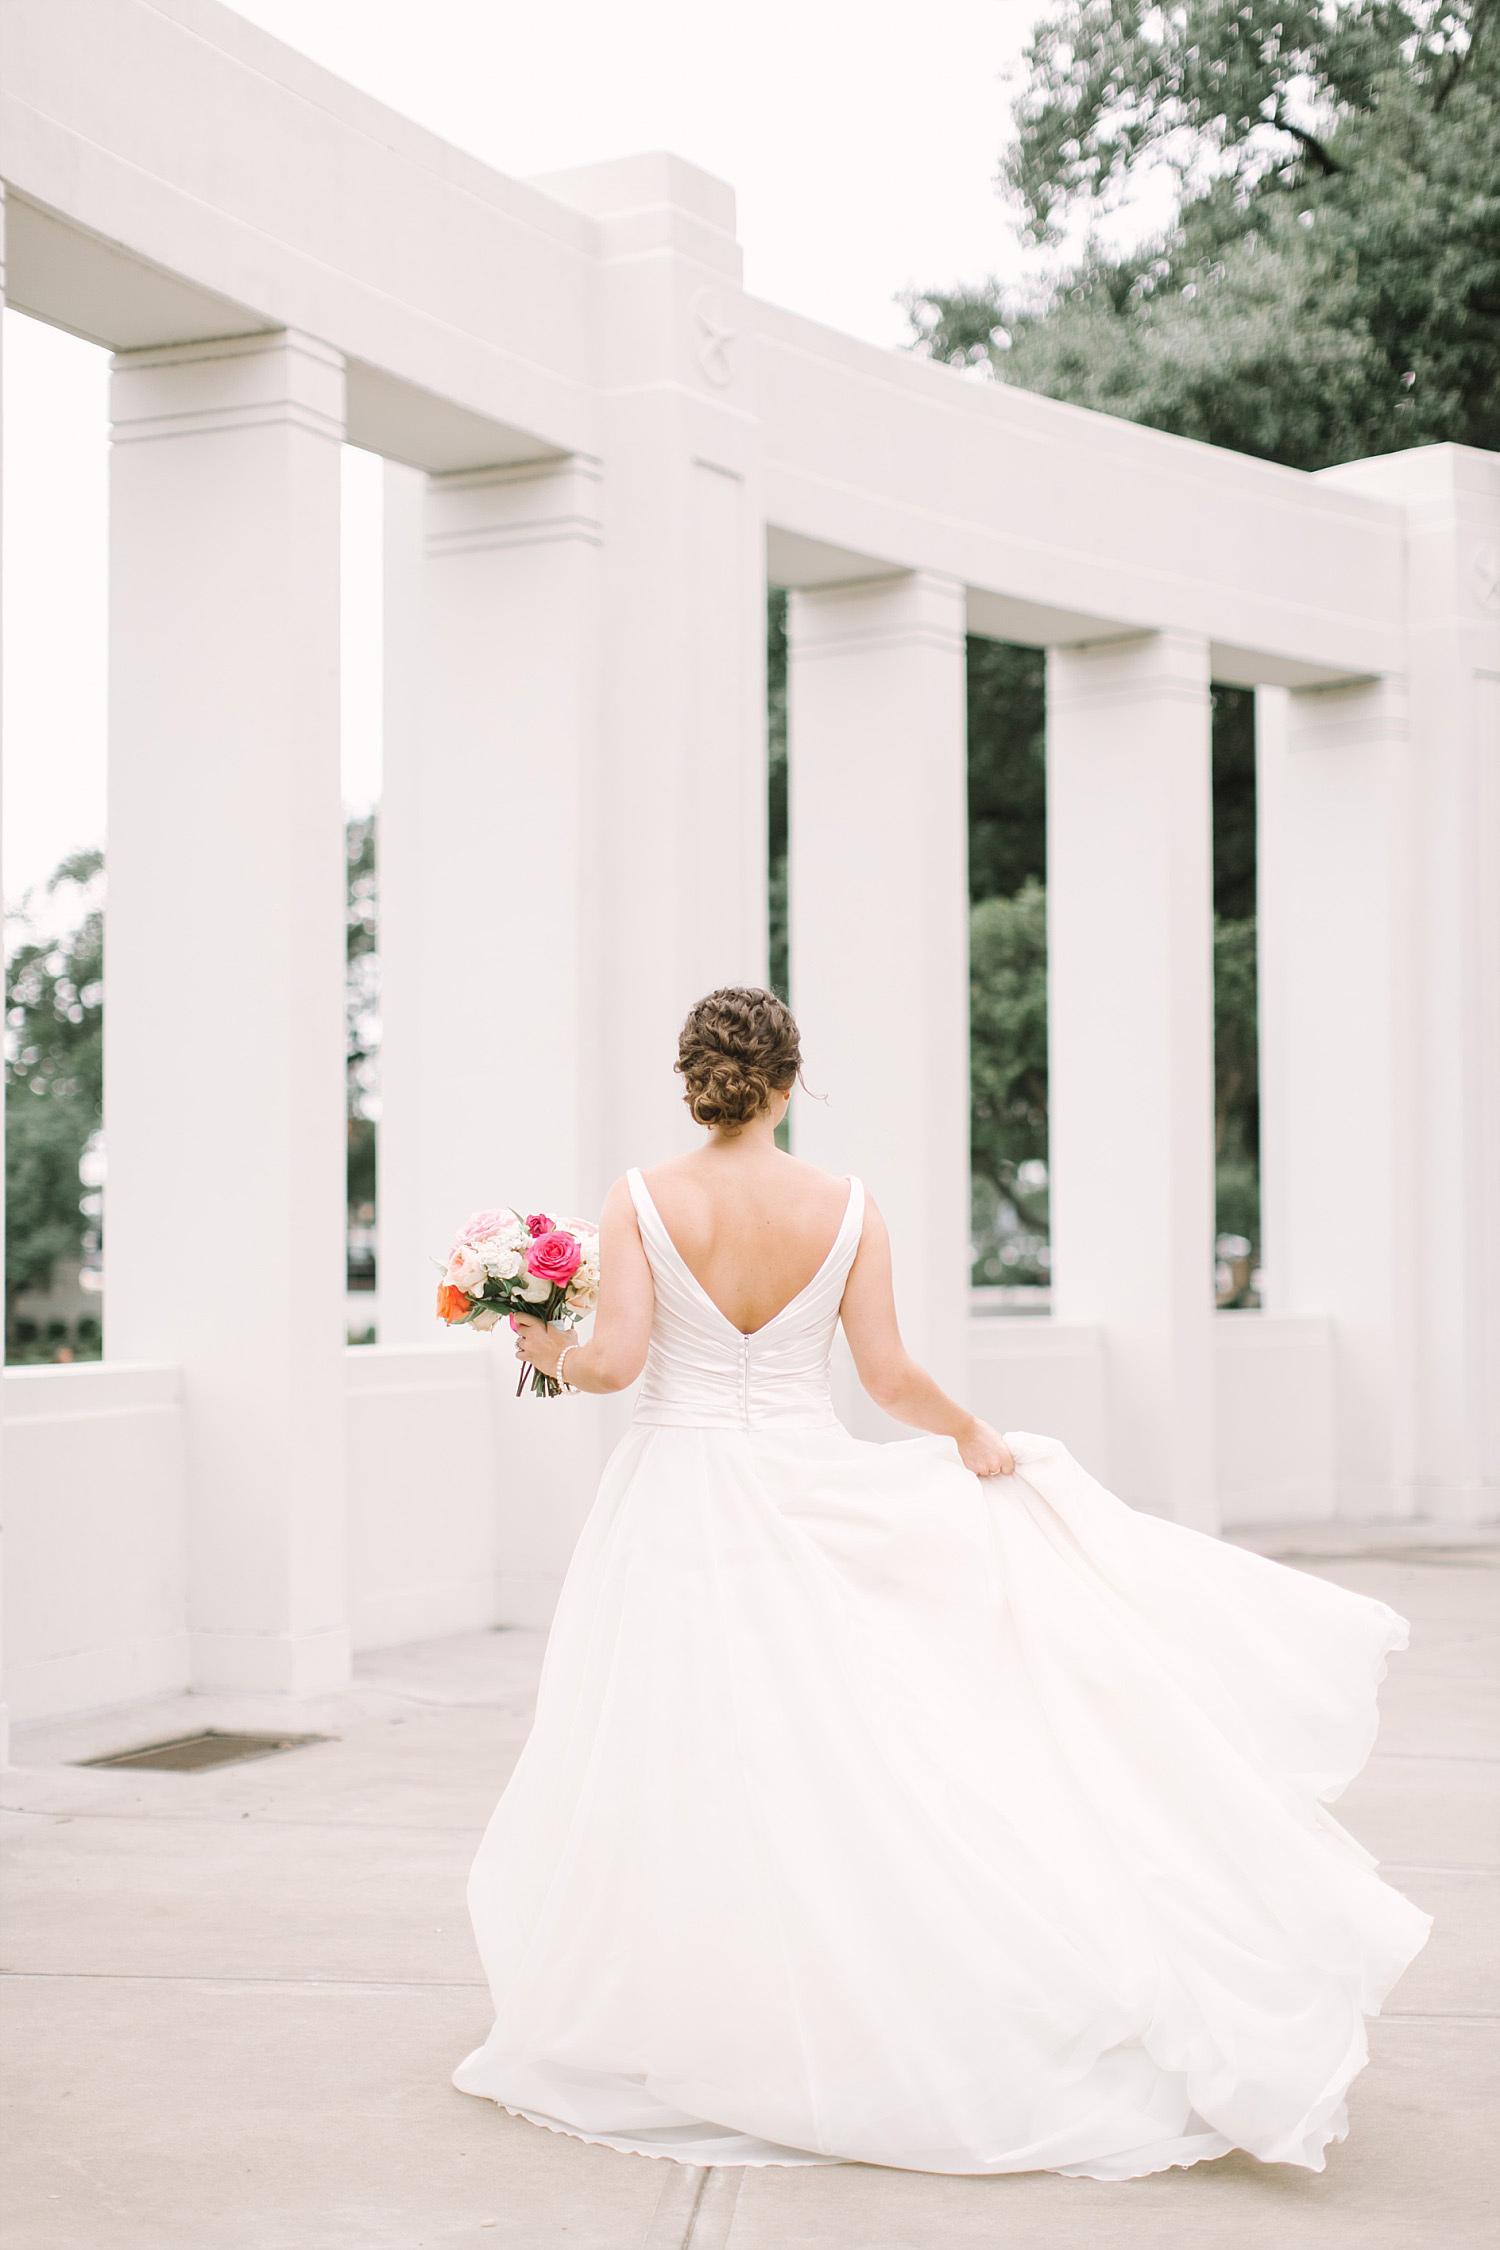 Bridal portrait at John Kennedy memorial